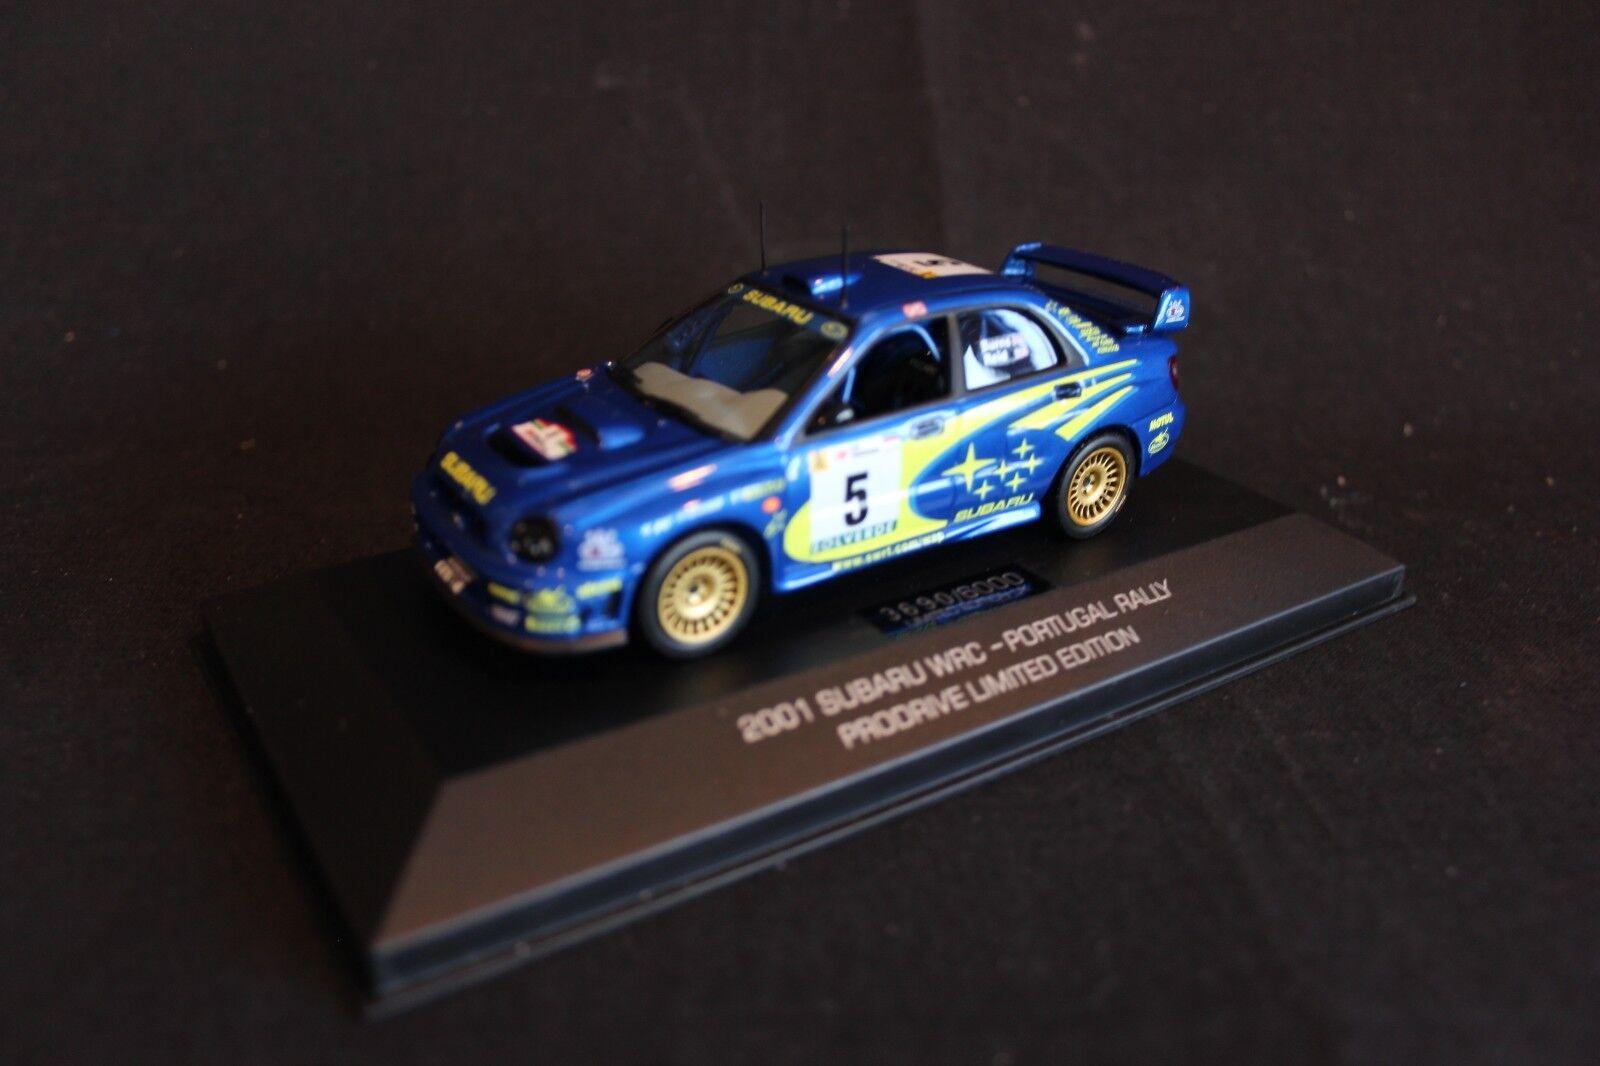 Prodrive Subaru Impreza WRC 2001 1:43  5 Burns / Reid Rallye Monte-Carlo